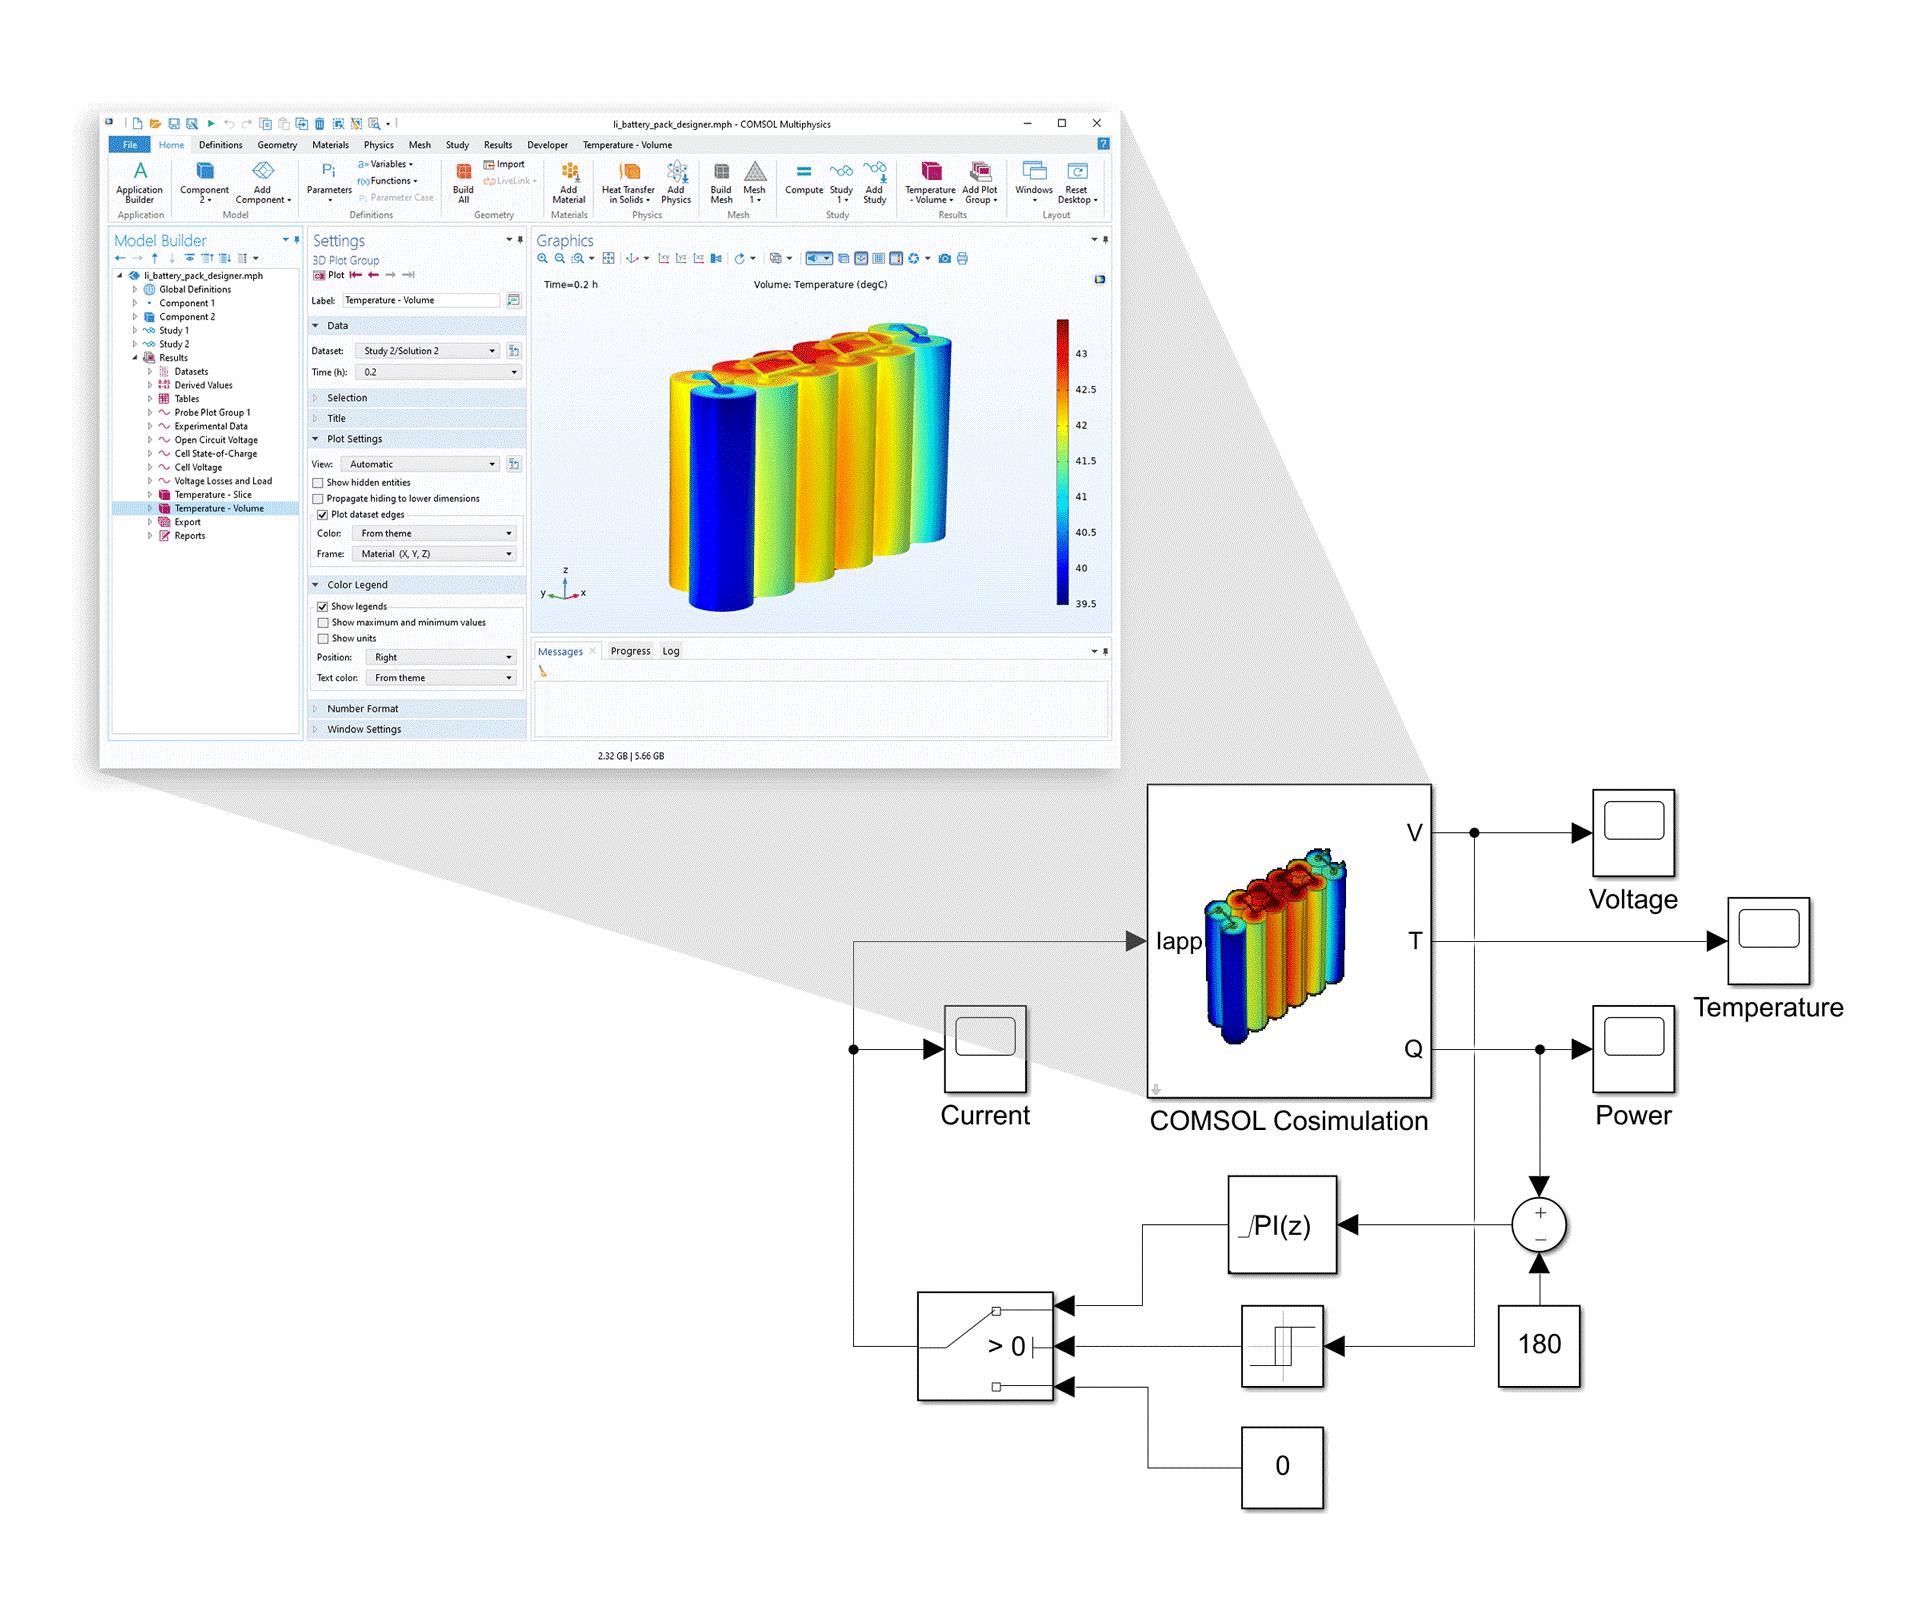 COMSOL Multiphysics®와 Simulink®를 사용해 통합 시뮬레이션한 배터리 팩 예제